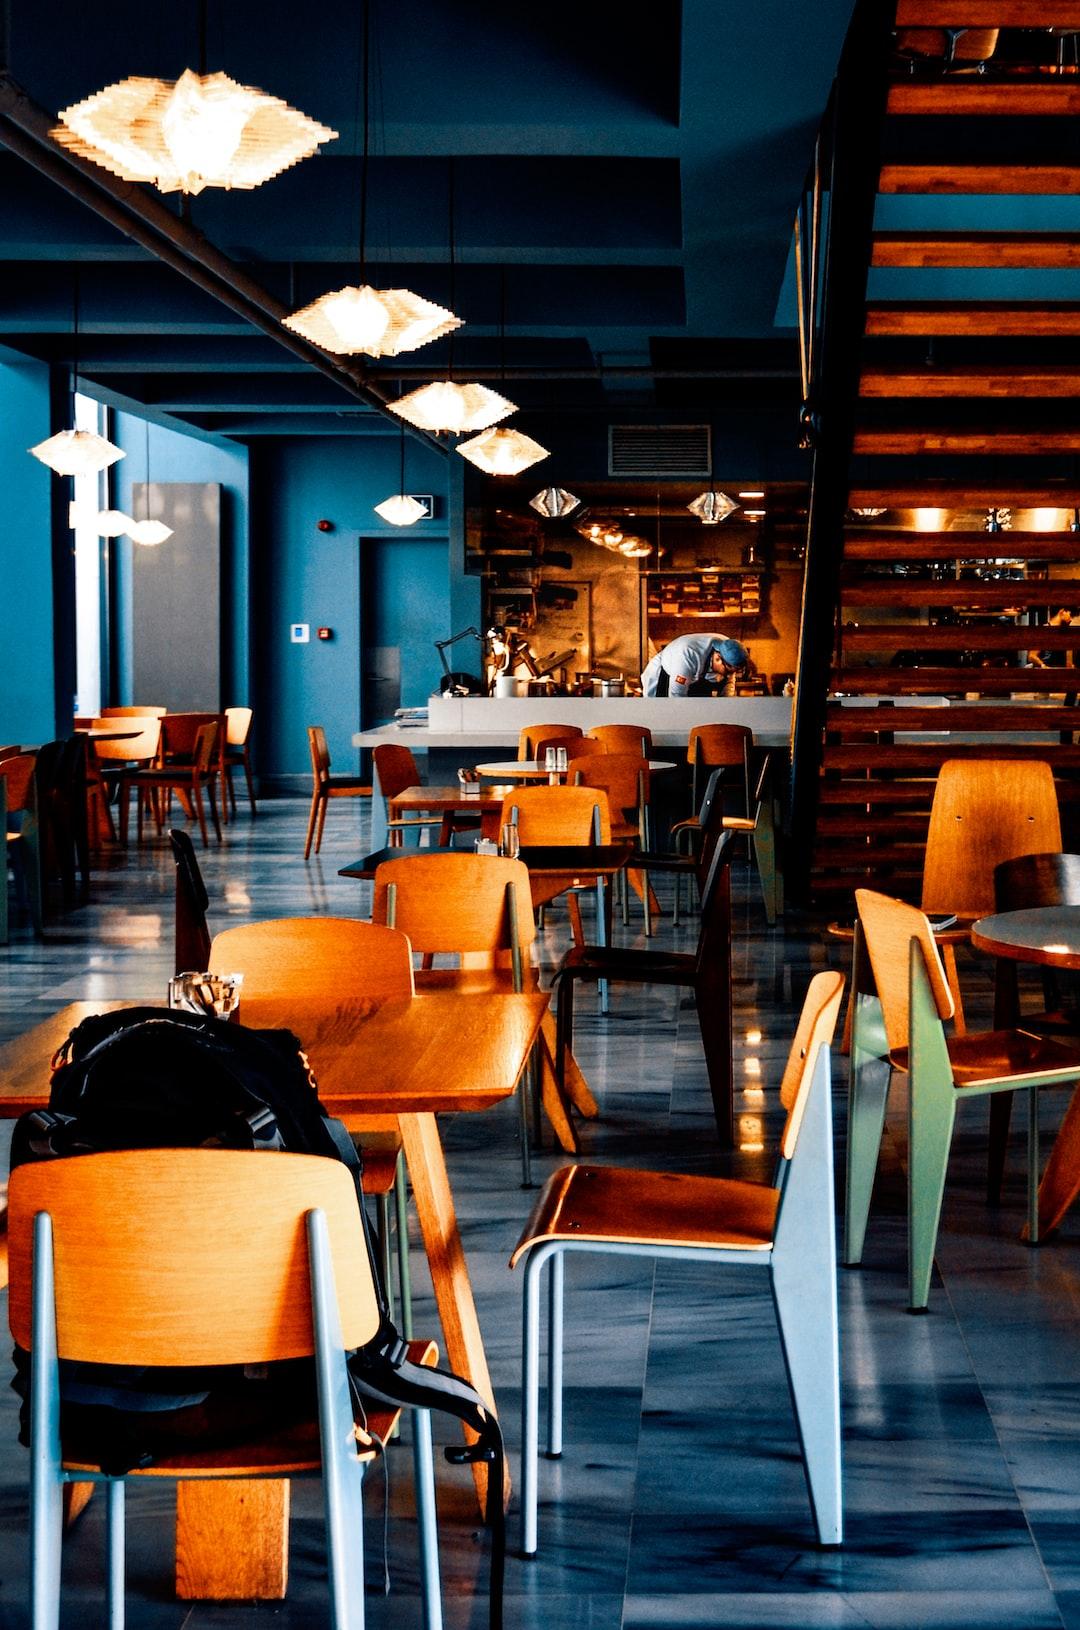 Restaurant Furniture for Illinois